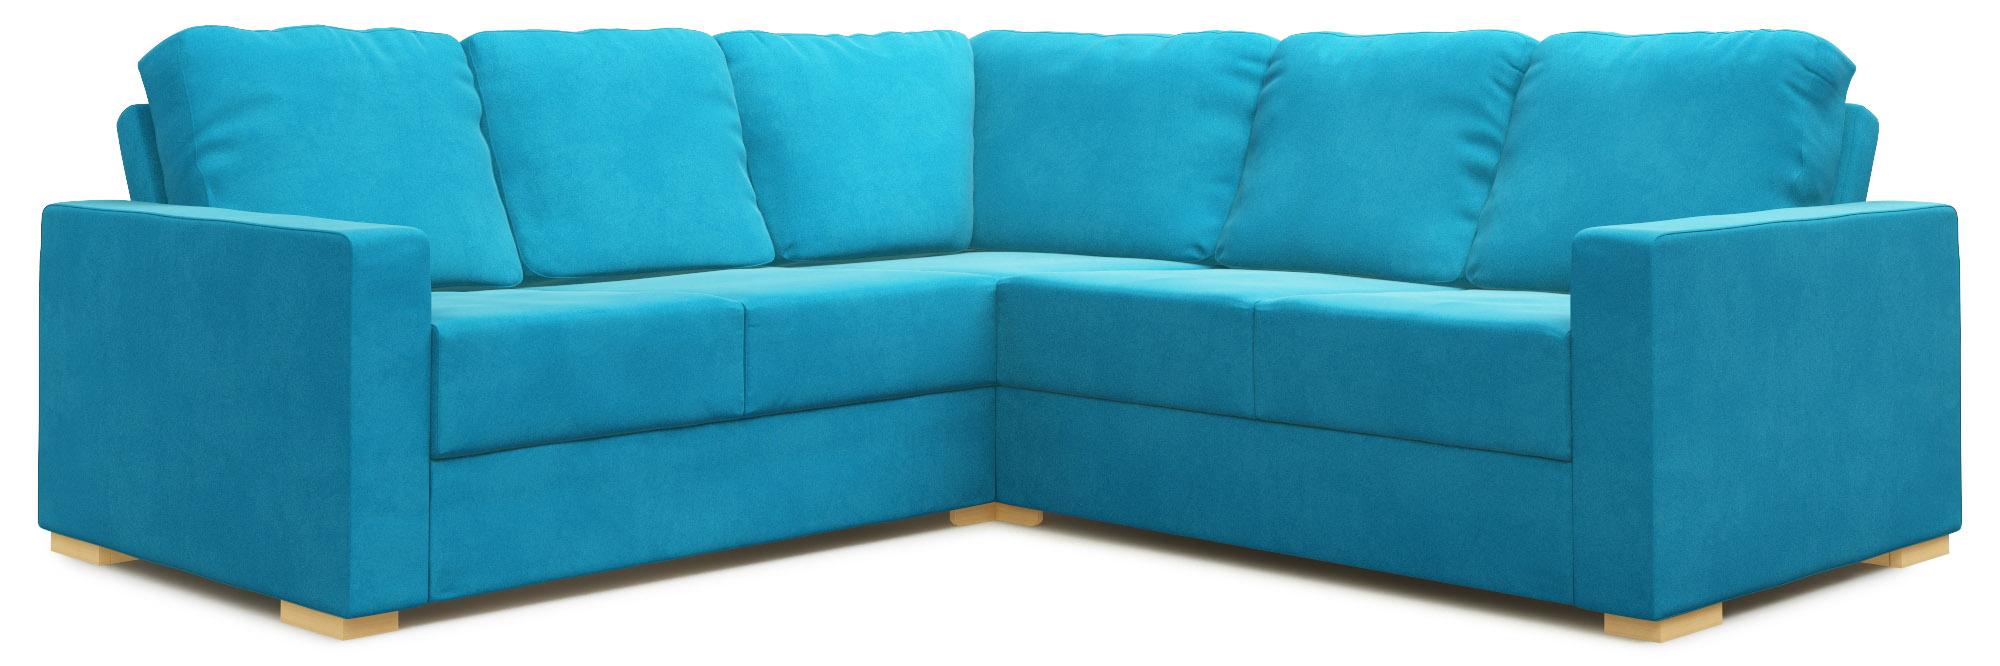 Lear 3X3 Corner Single Sofa Bed